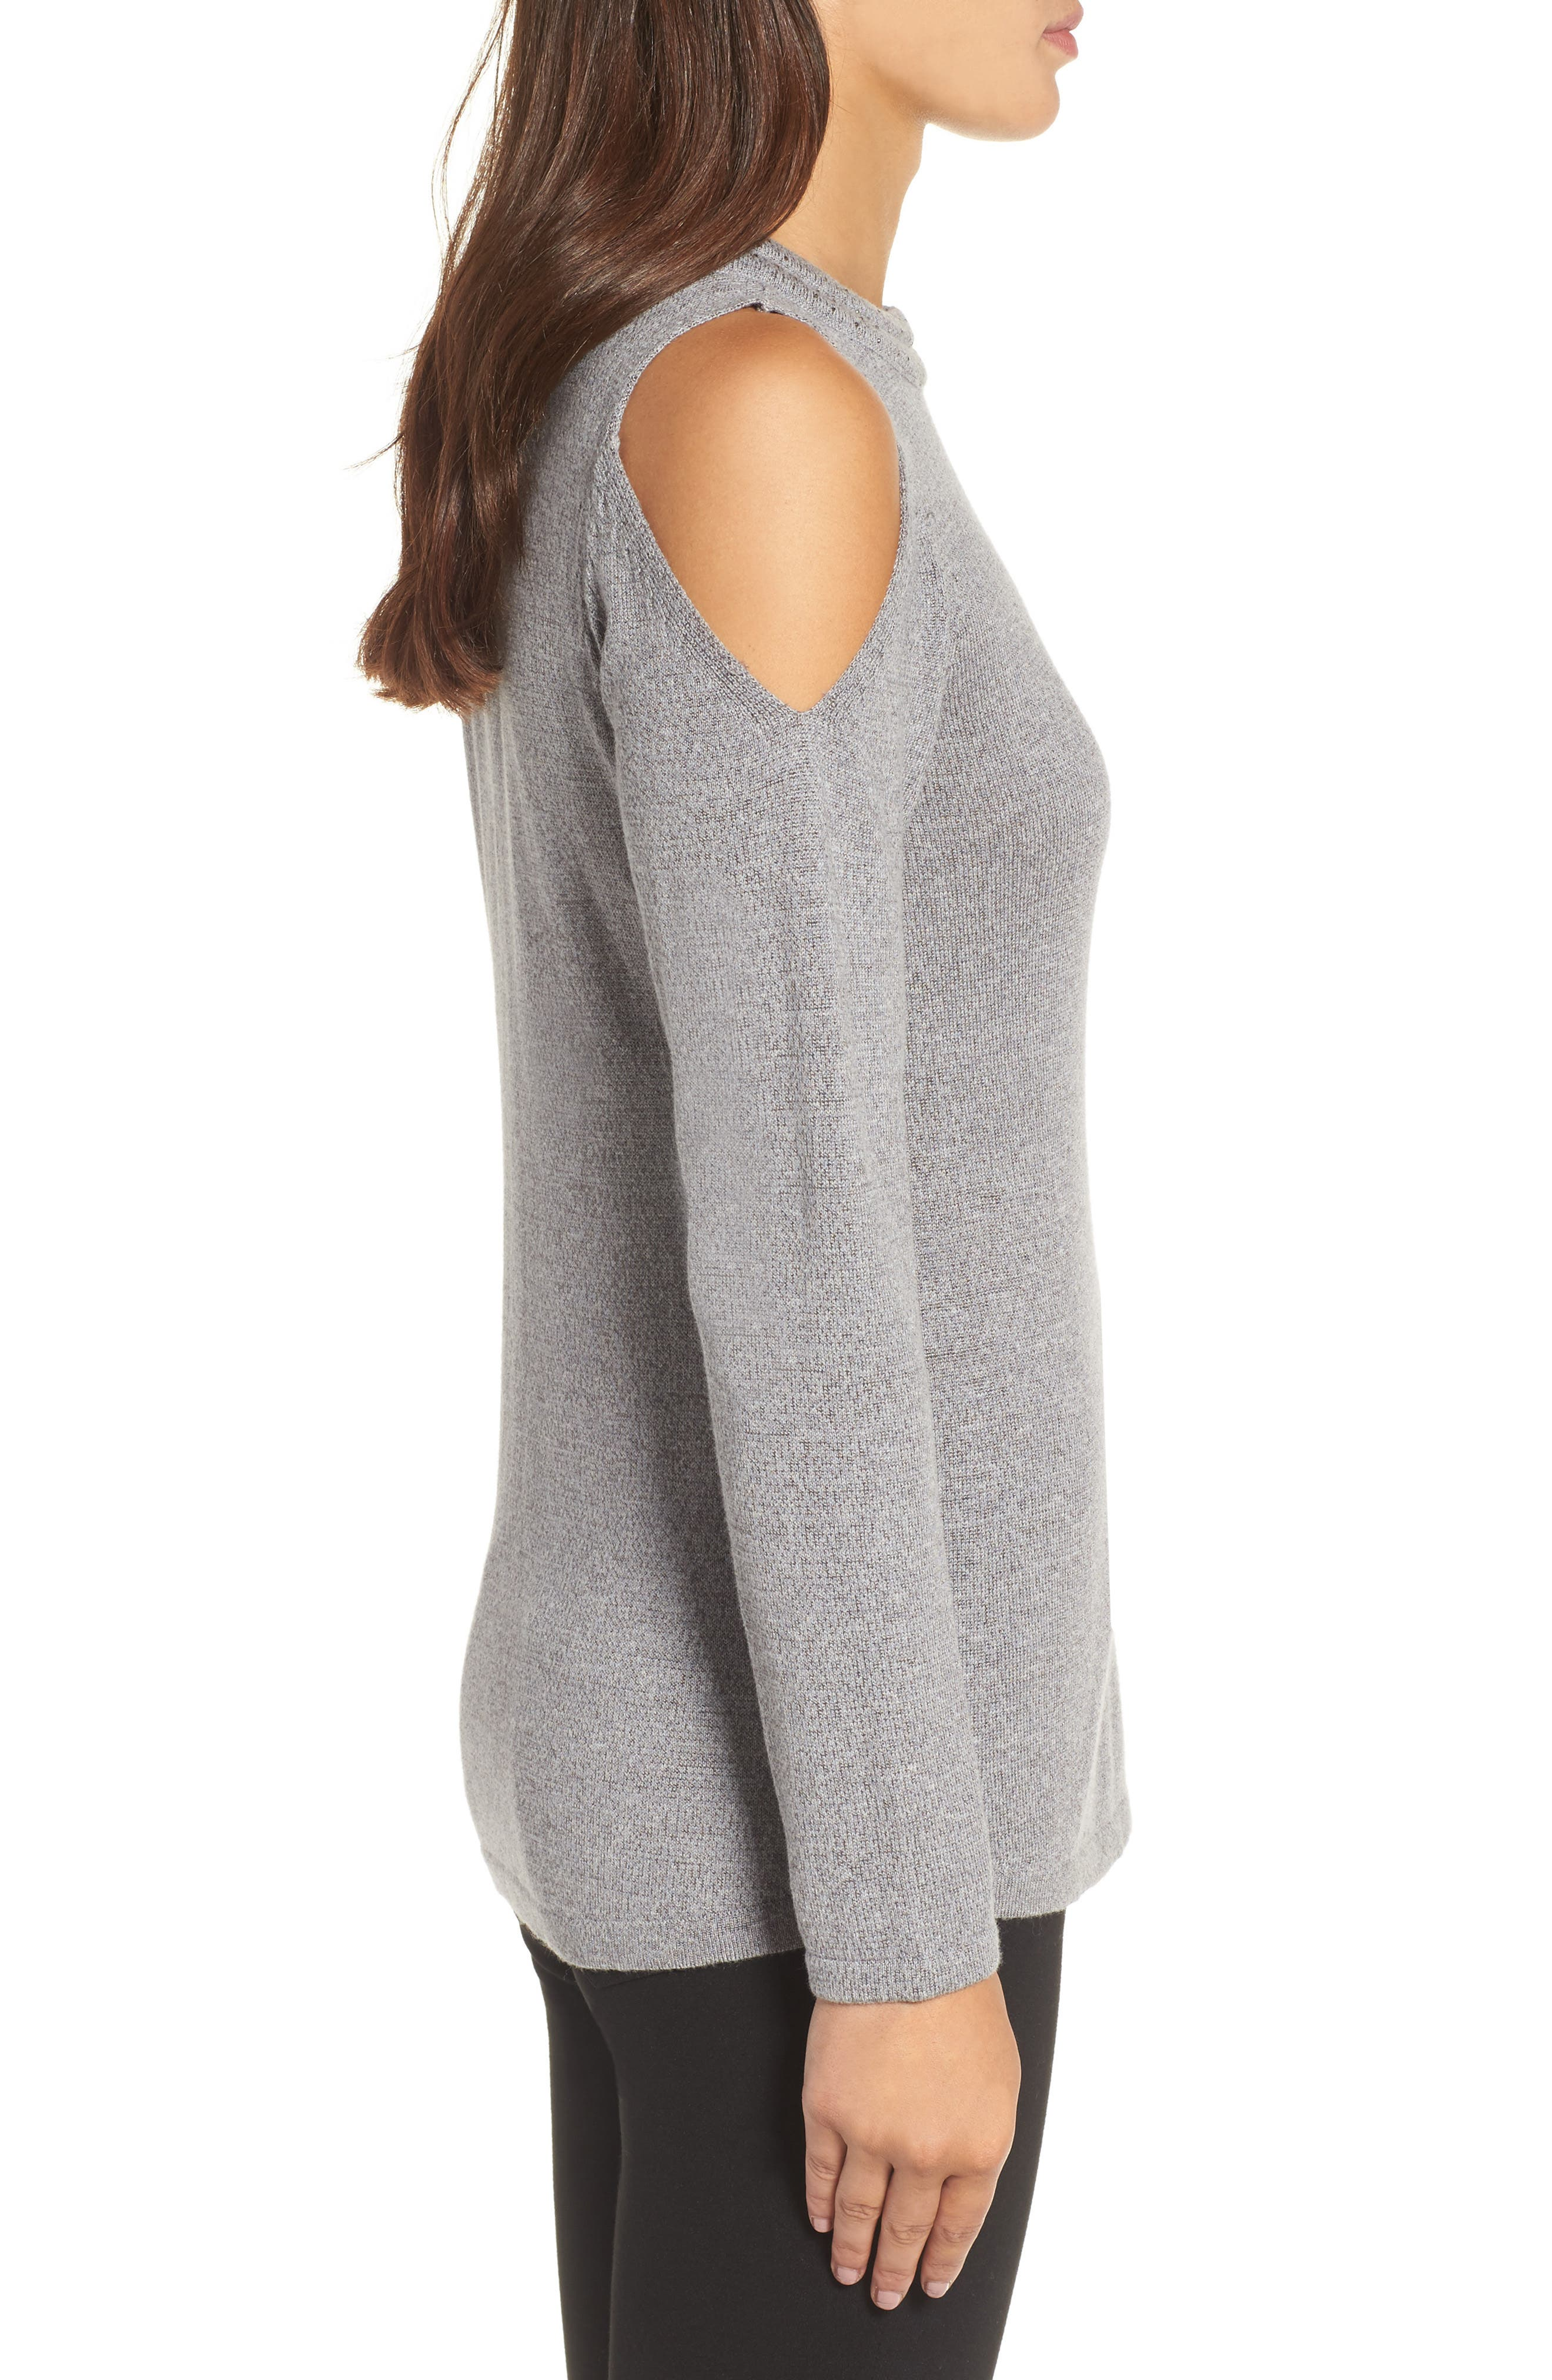 Alternate Image 3  - NIC+ZOE Jewel Neck Cold Shoulder Top (Regular & Petite)